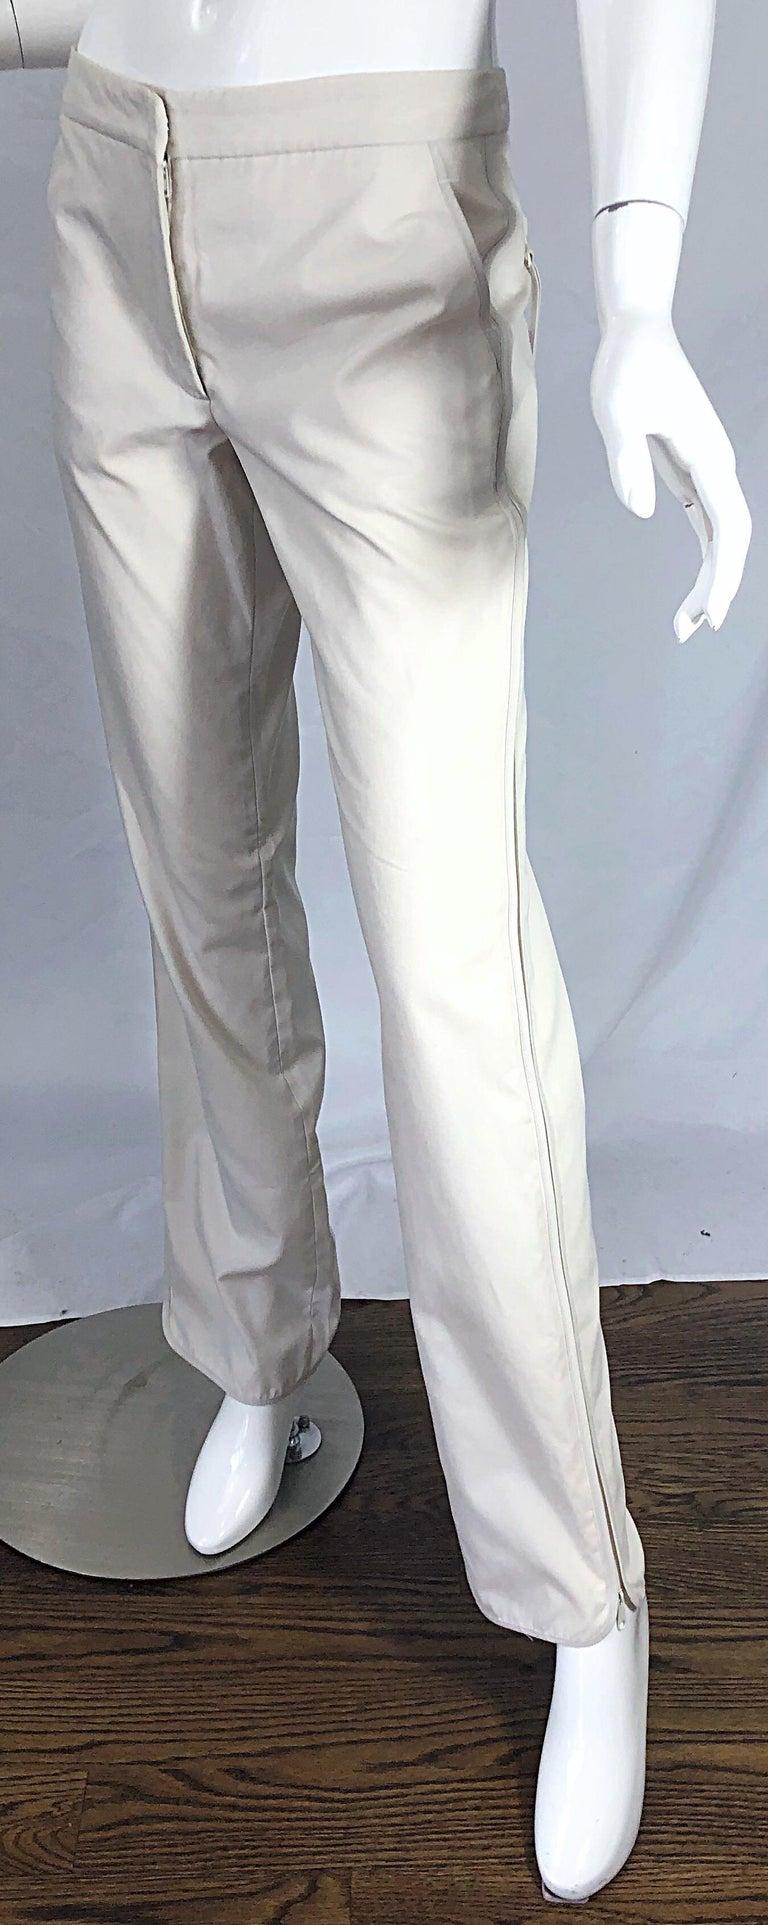 1990s Katayone Adeli Size 6 Zipper Leg Low Rise Stone Khaki Trousers Pants  For Sale 1